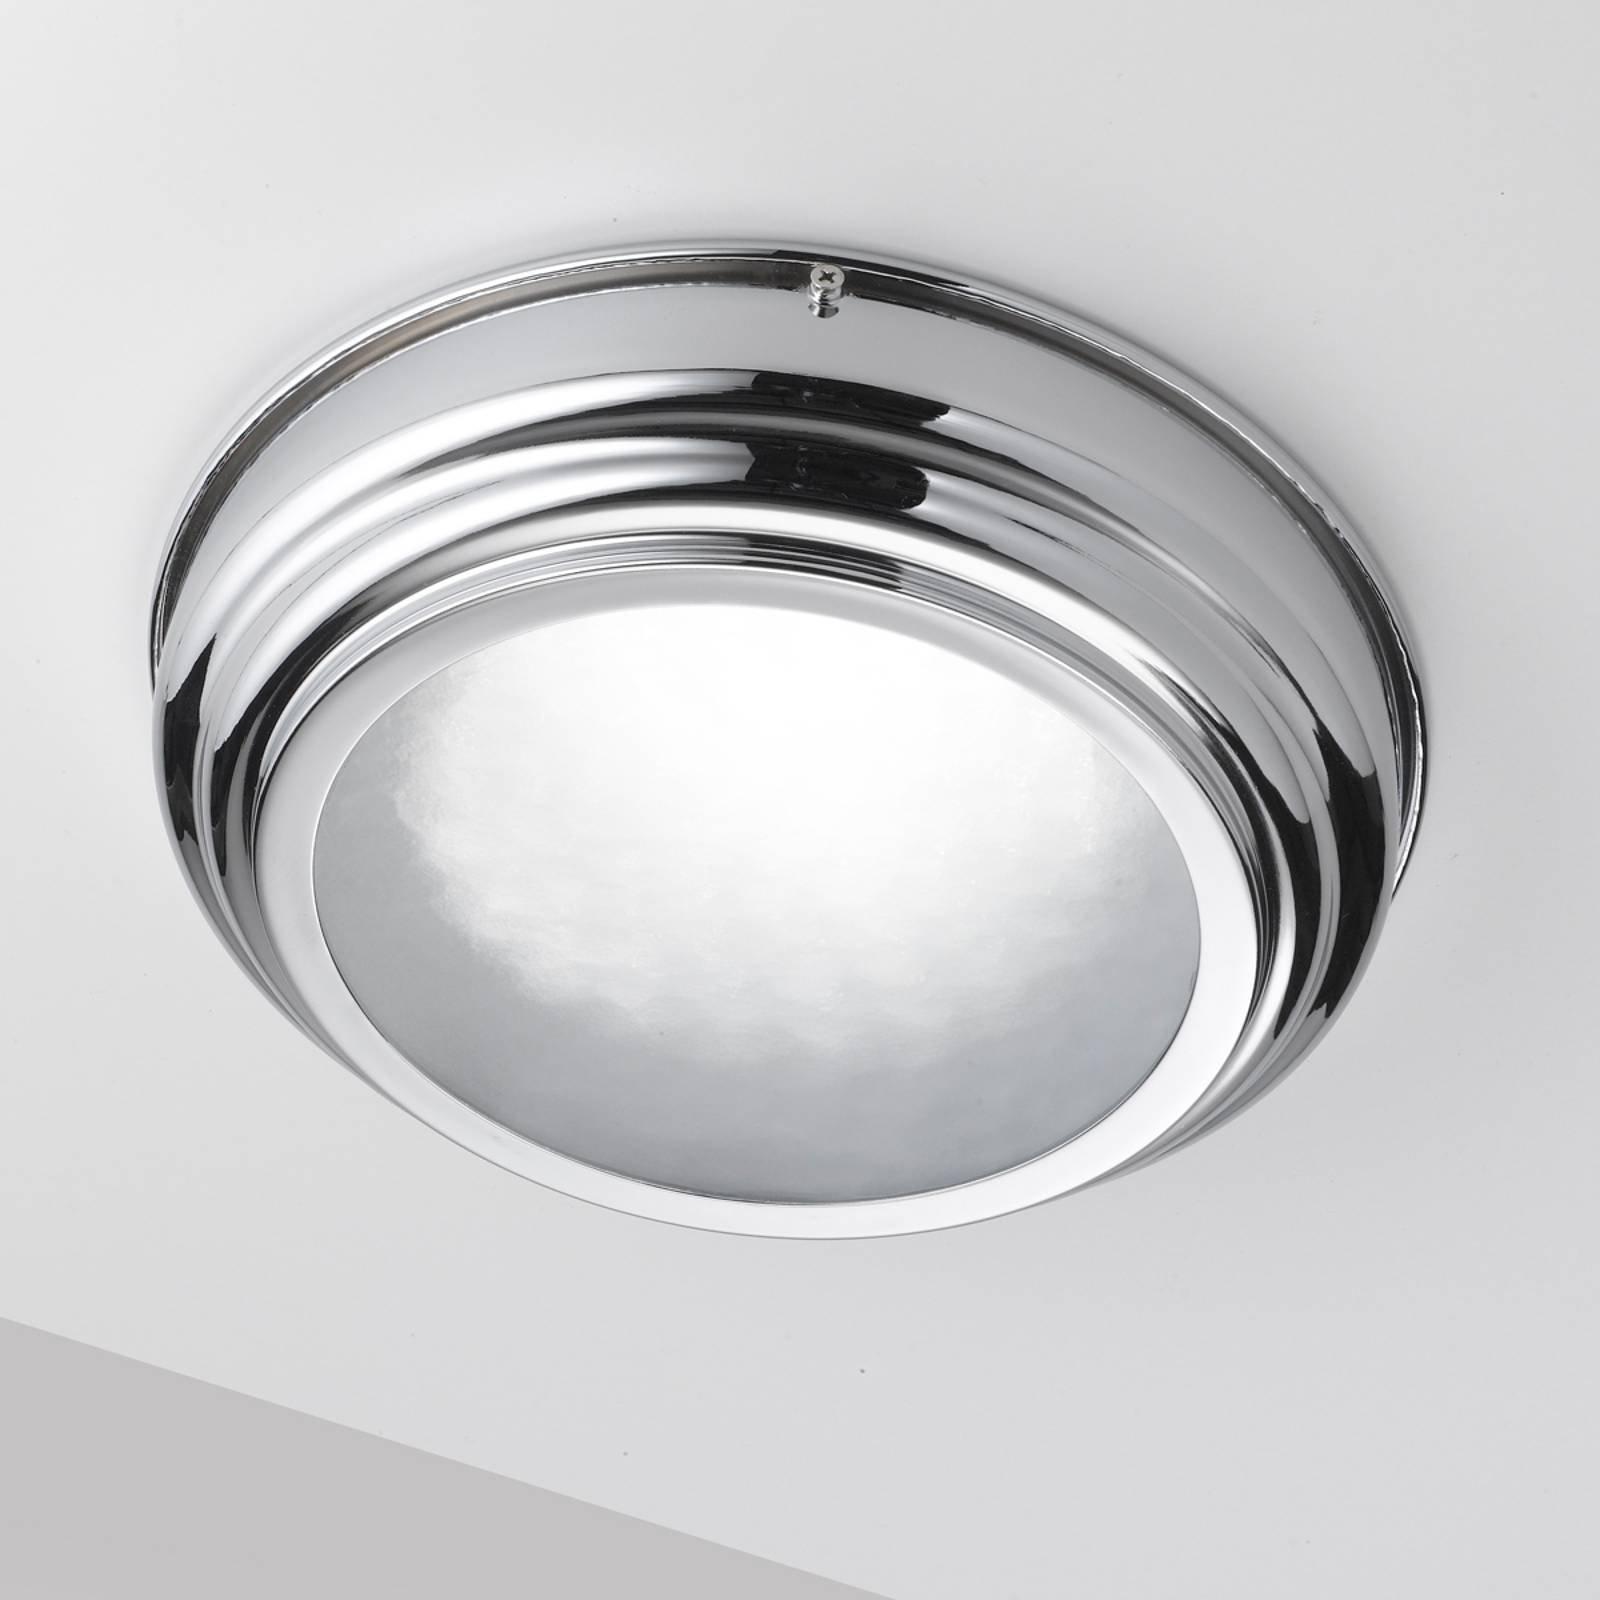 LED-taklampe med Scirocco 39 cm, krom blank